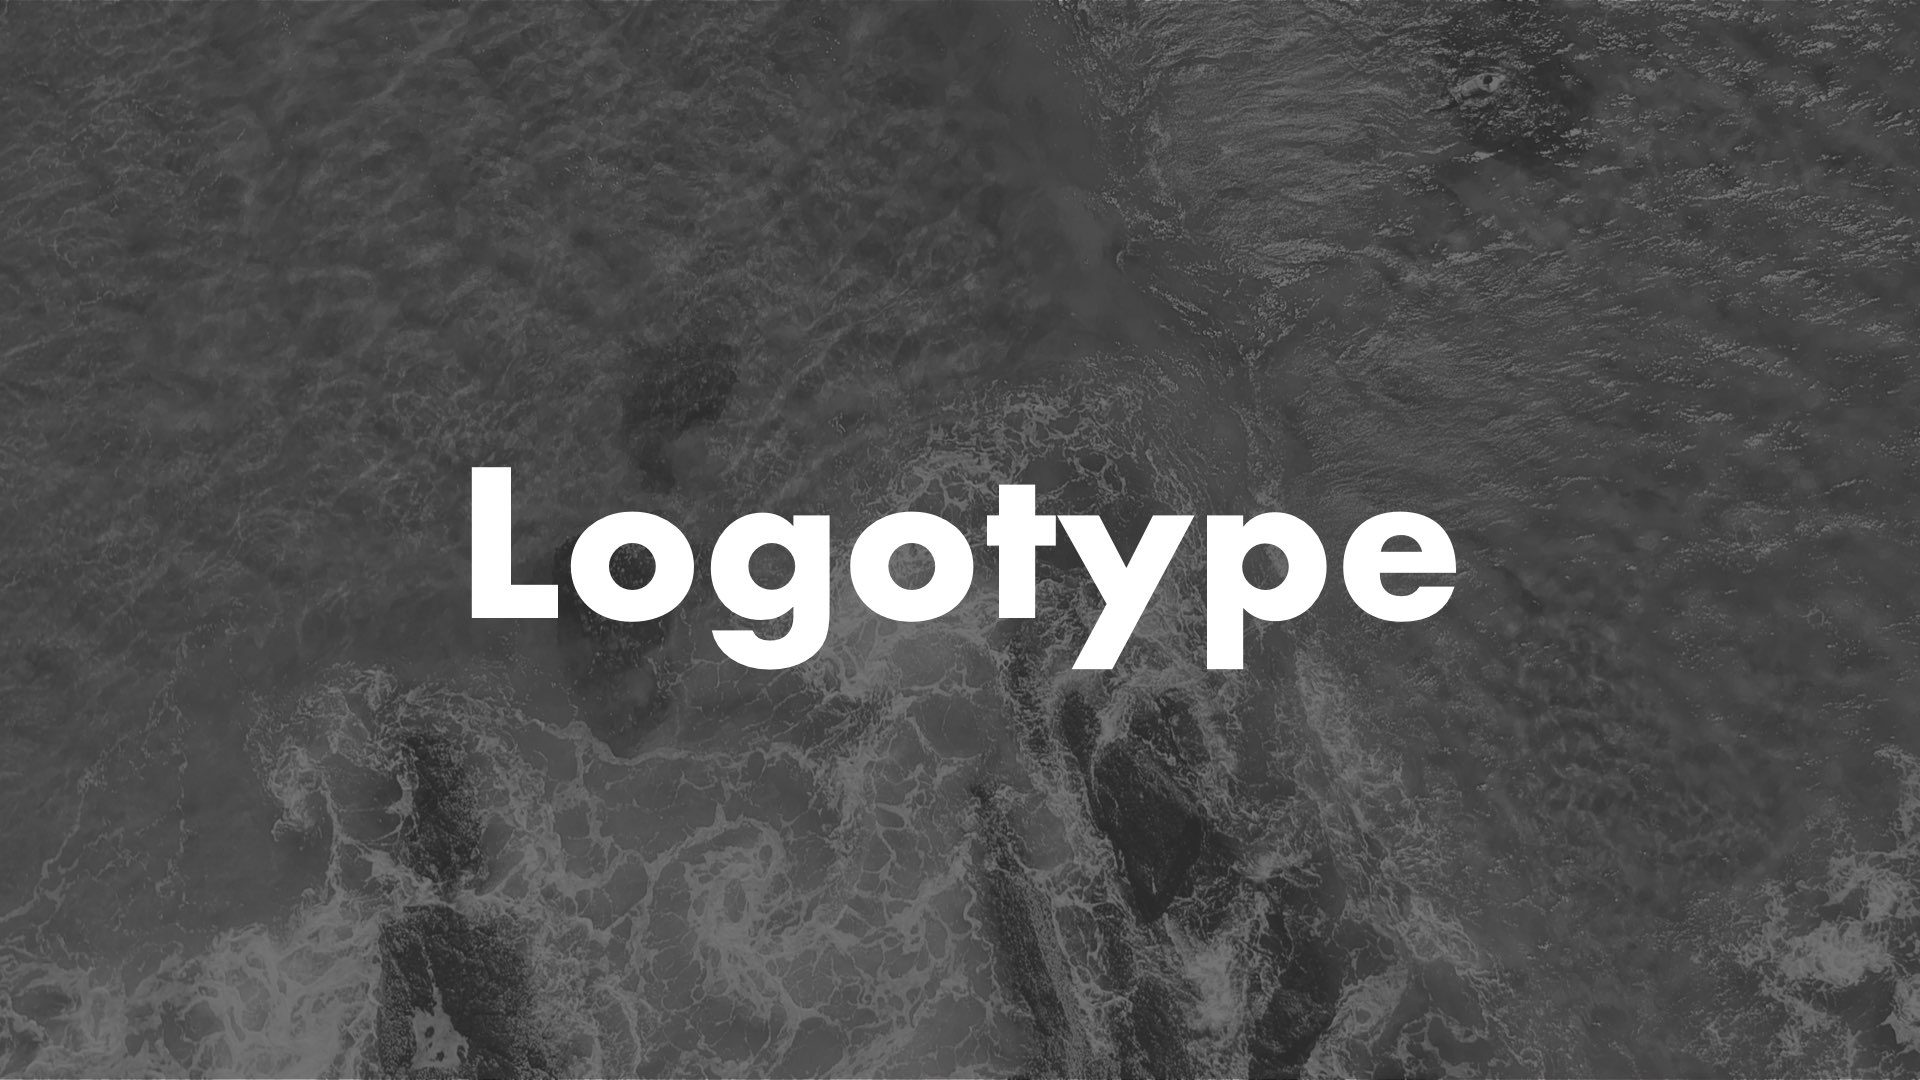 1200€ - Analysis of your brandA custom designed logotypeLogo usage guidelines——————